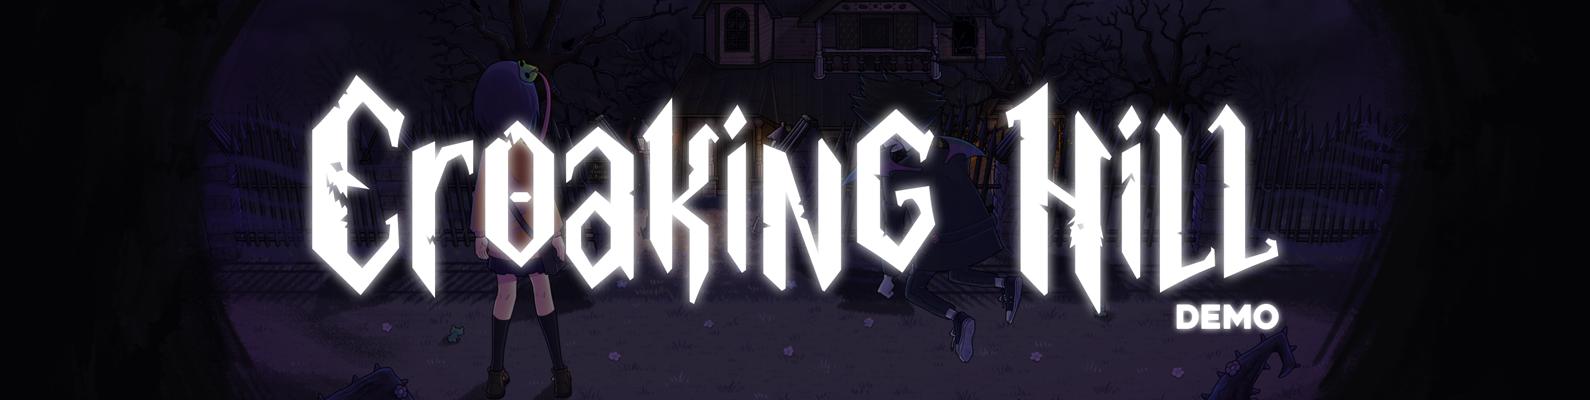 Croaking Hill: Demo